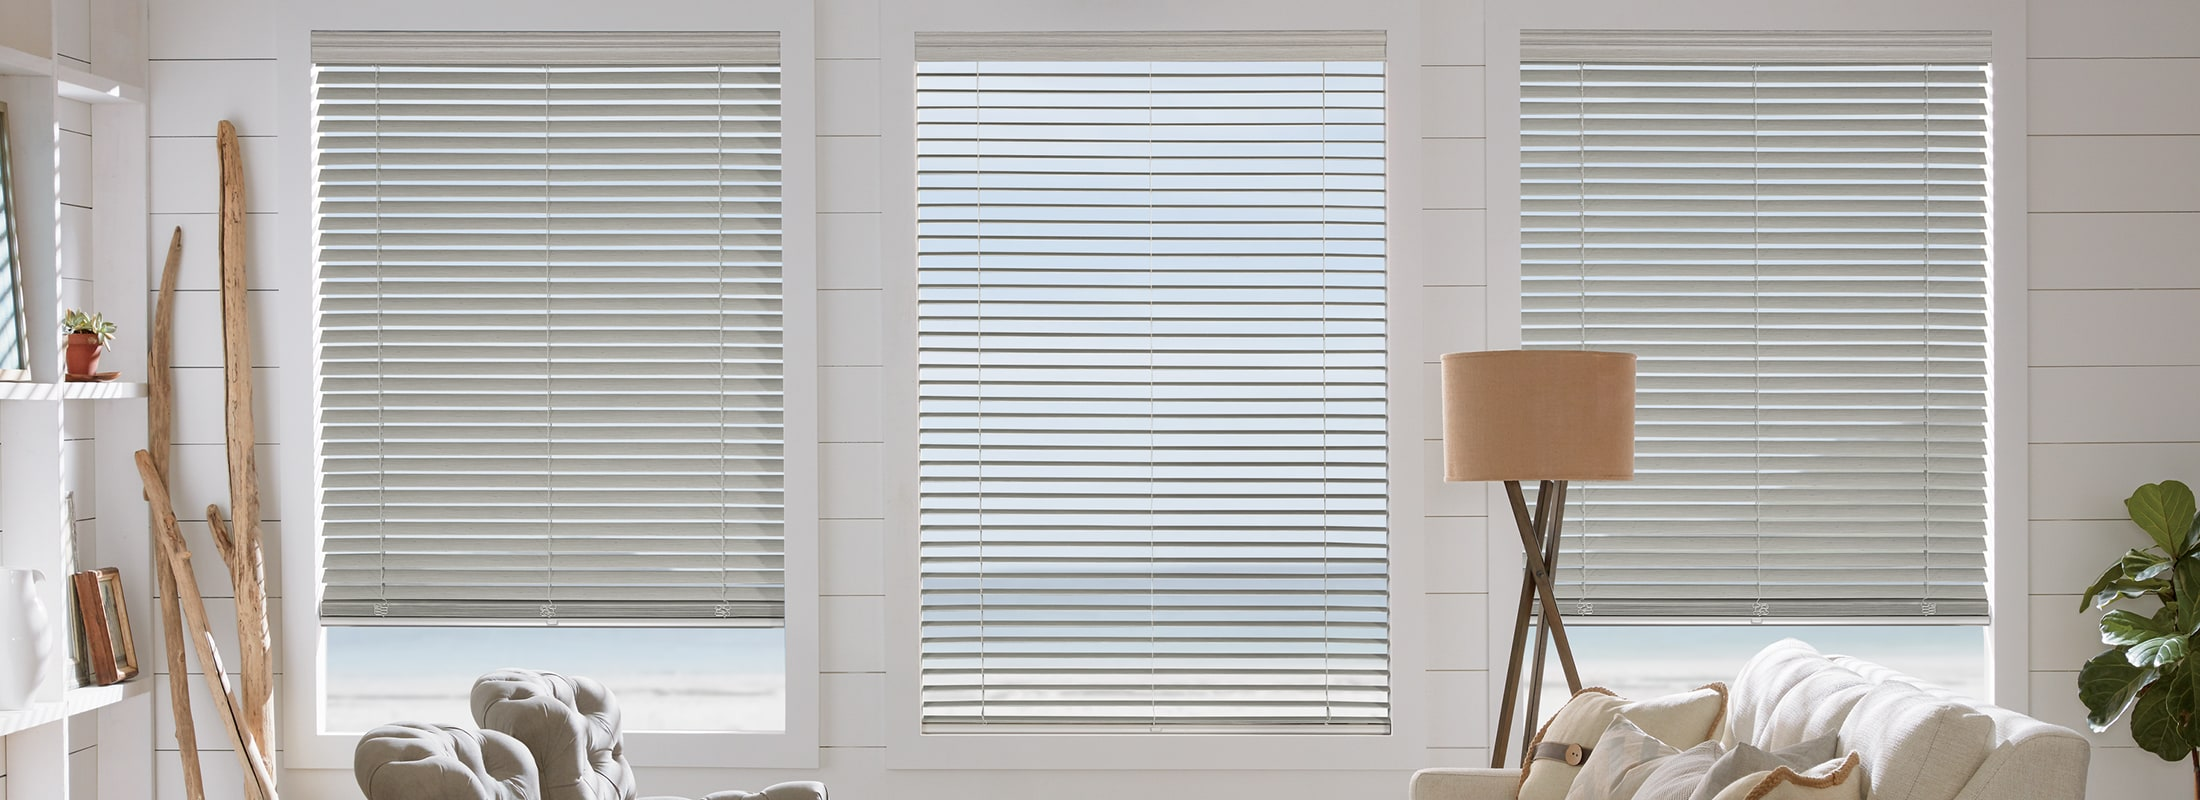 faux-wood-blinds-everwood-trugrain-carousel-01_0.jpg